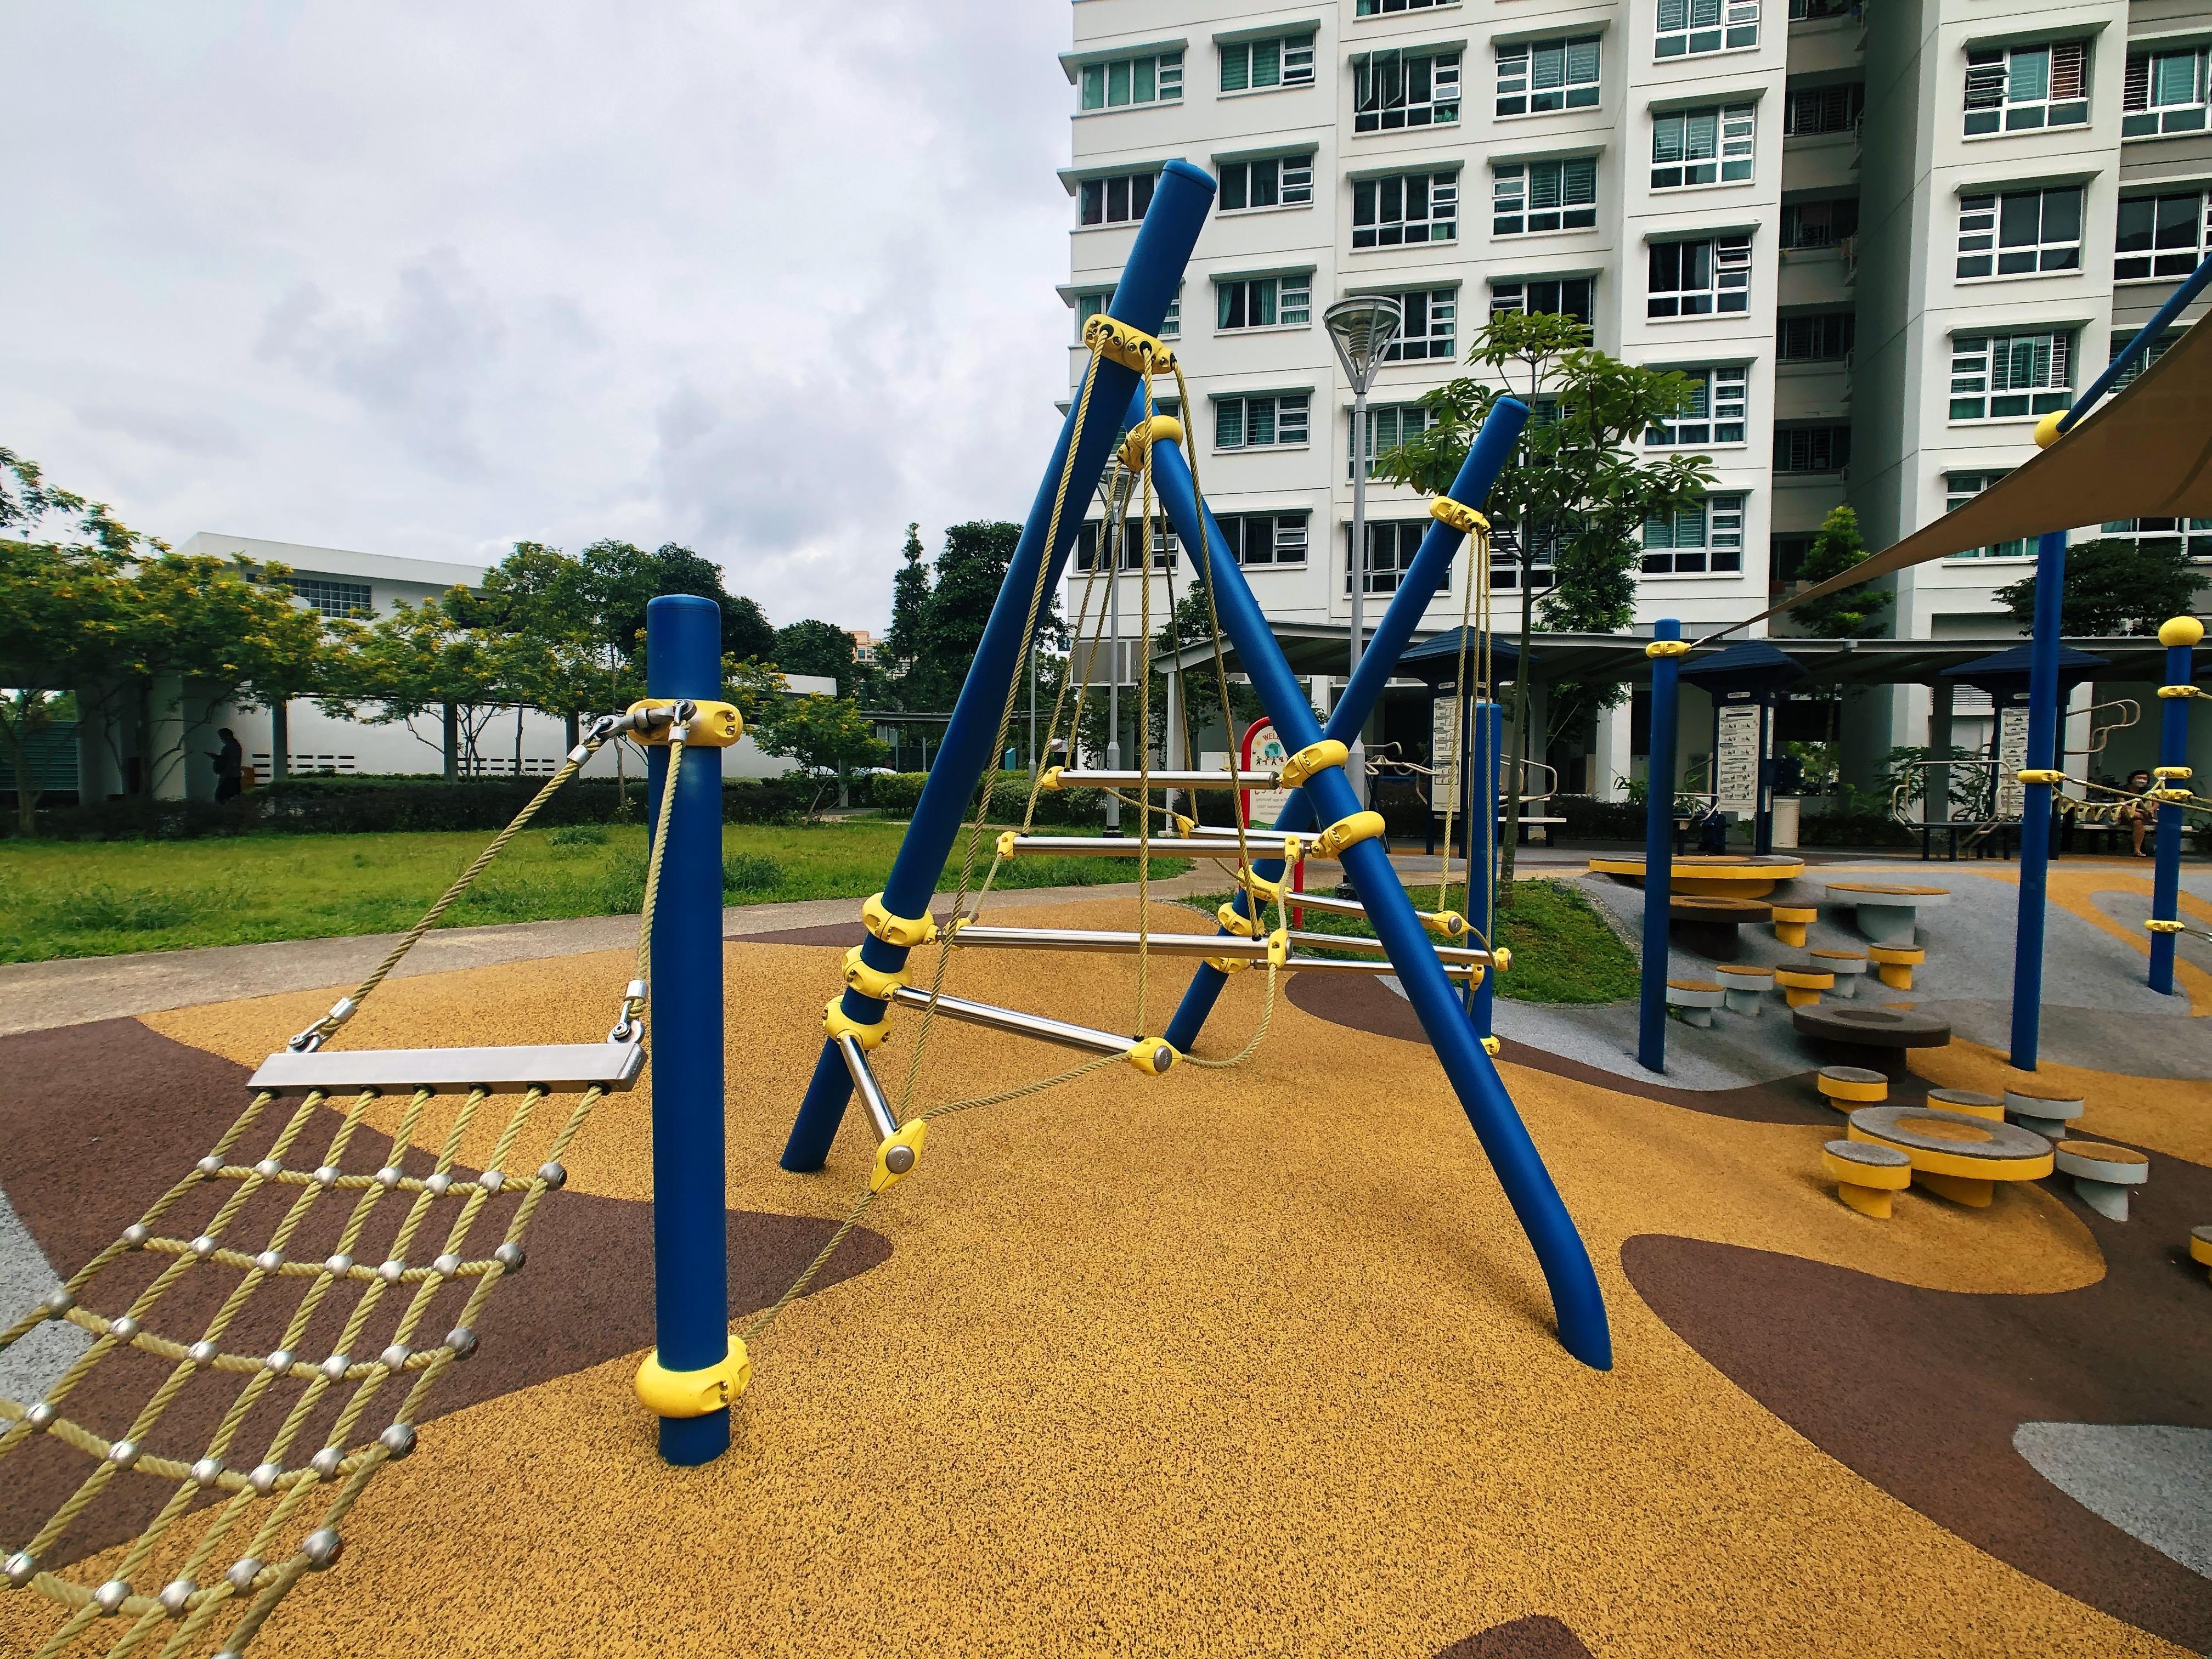 Toa Payoh Crest Playground